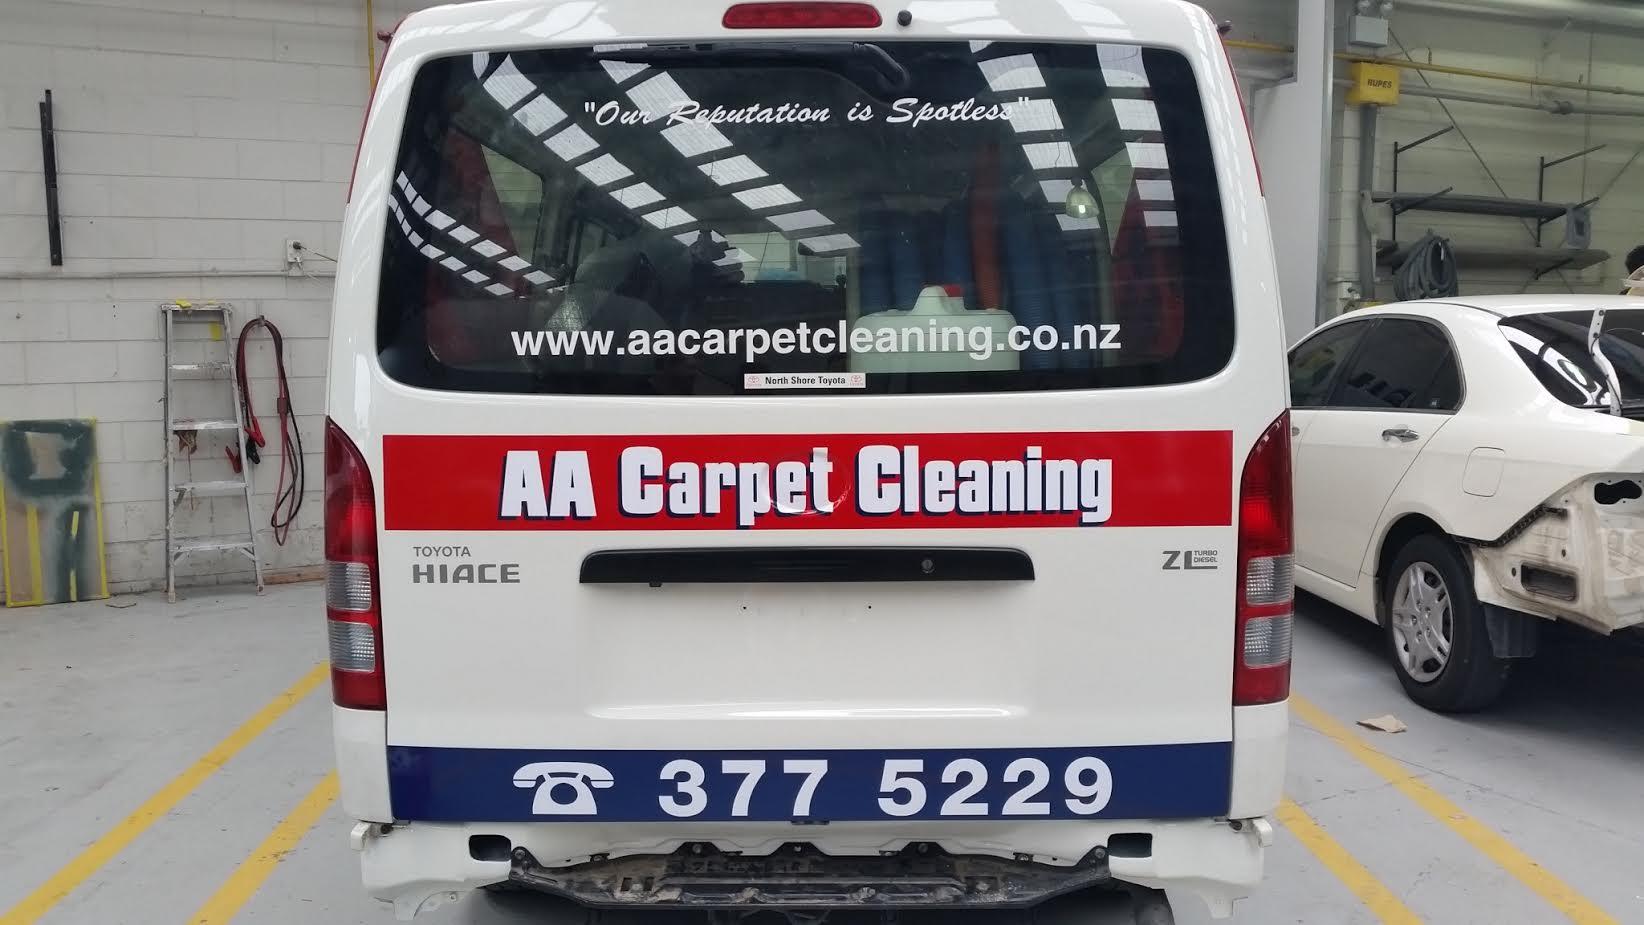 aa carpet